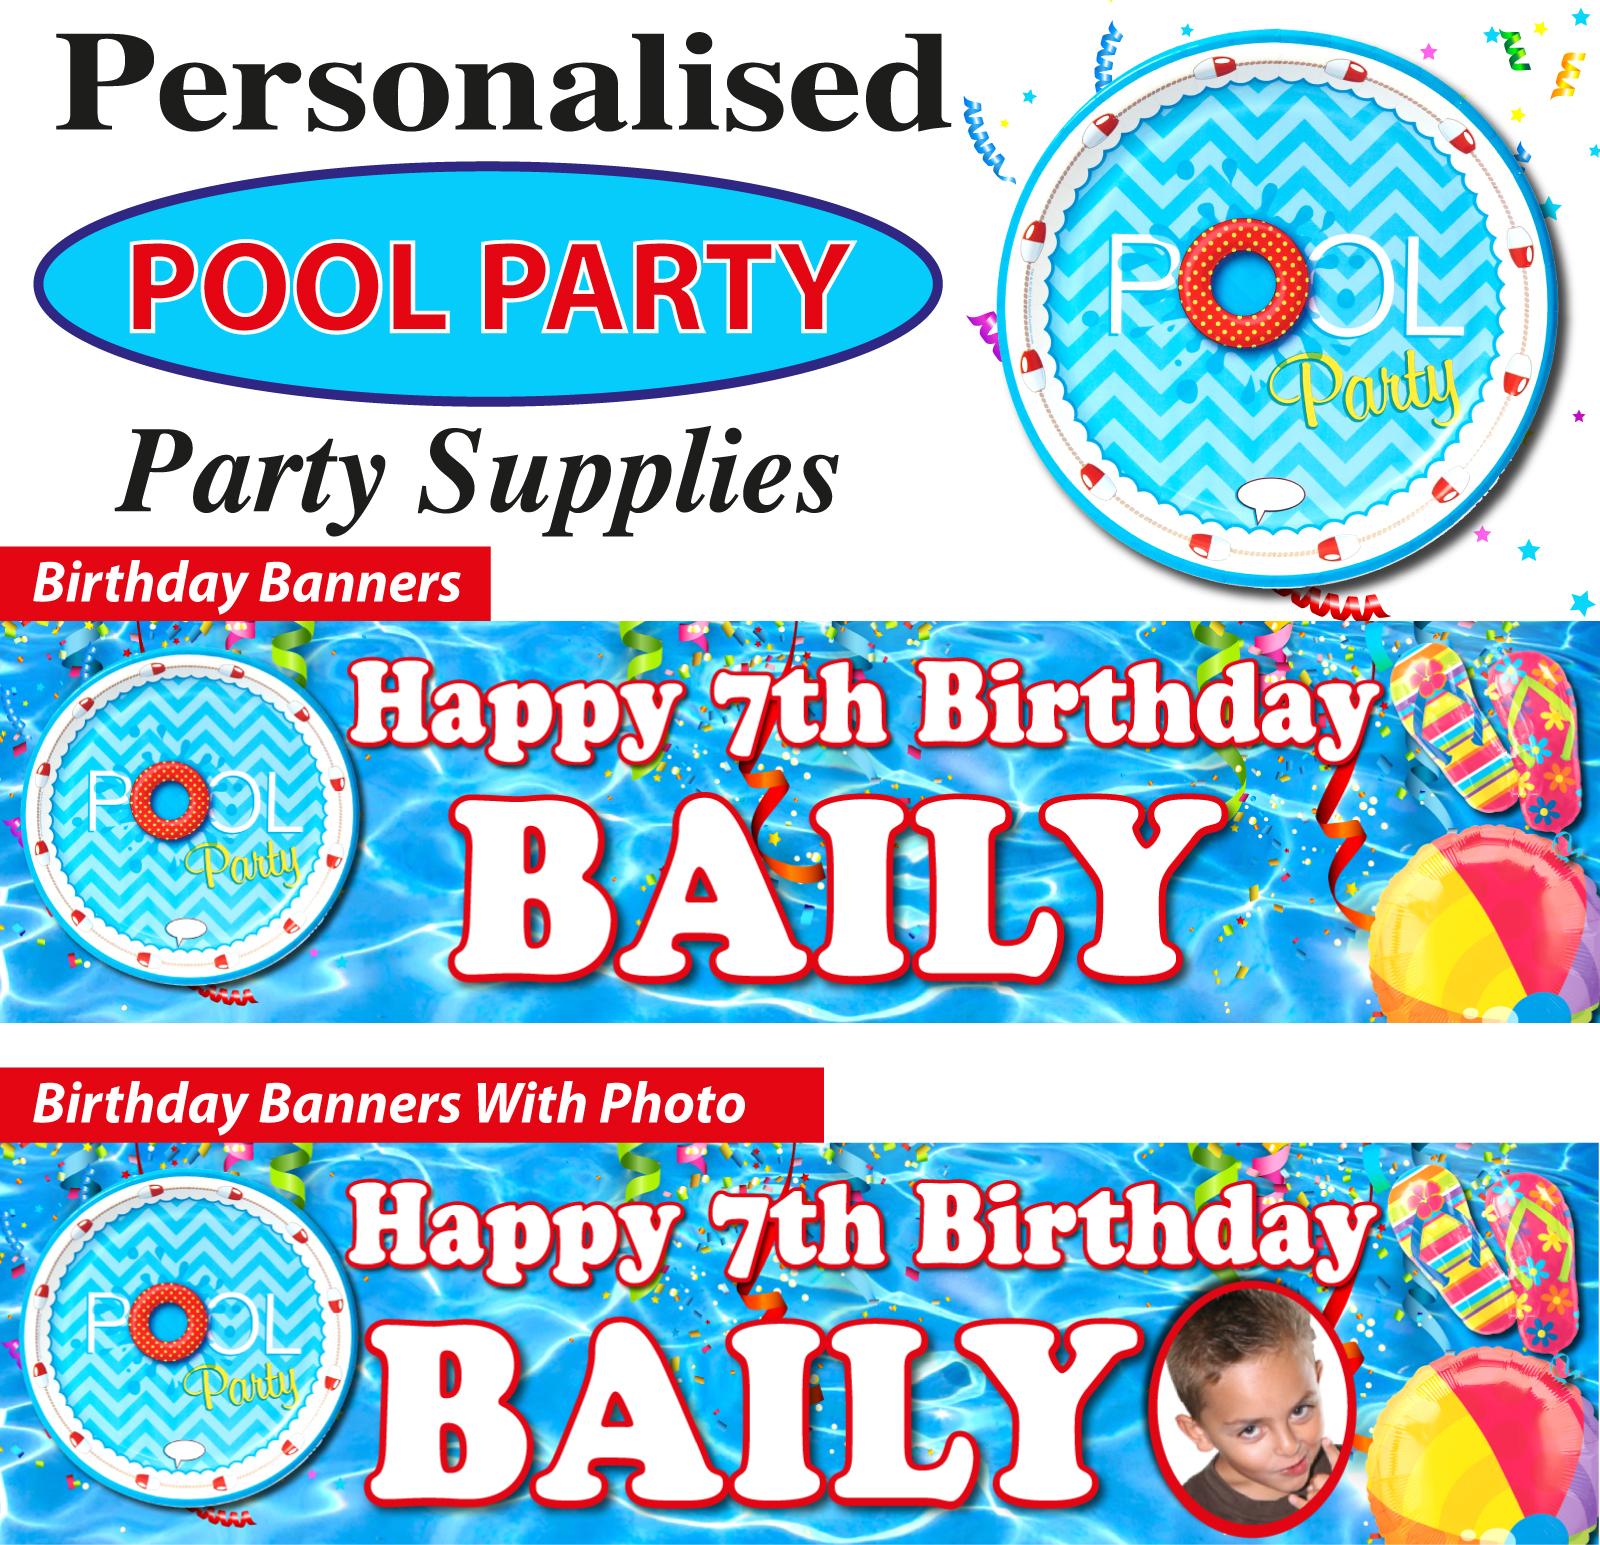 pool-party-banner-ebay.jpg